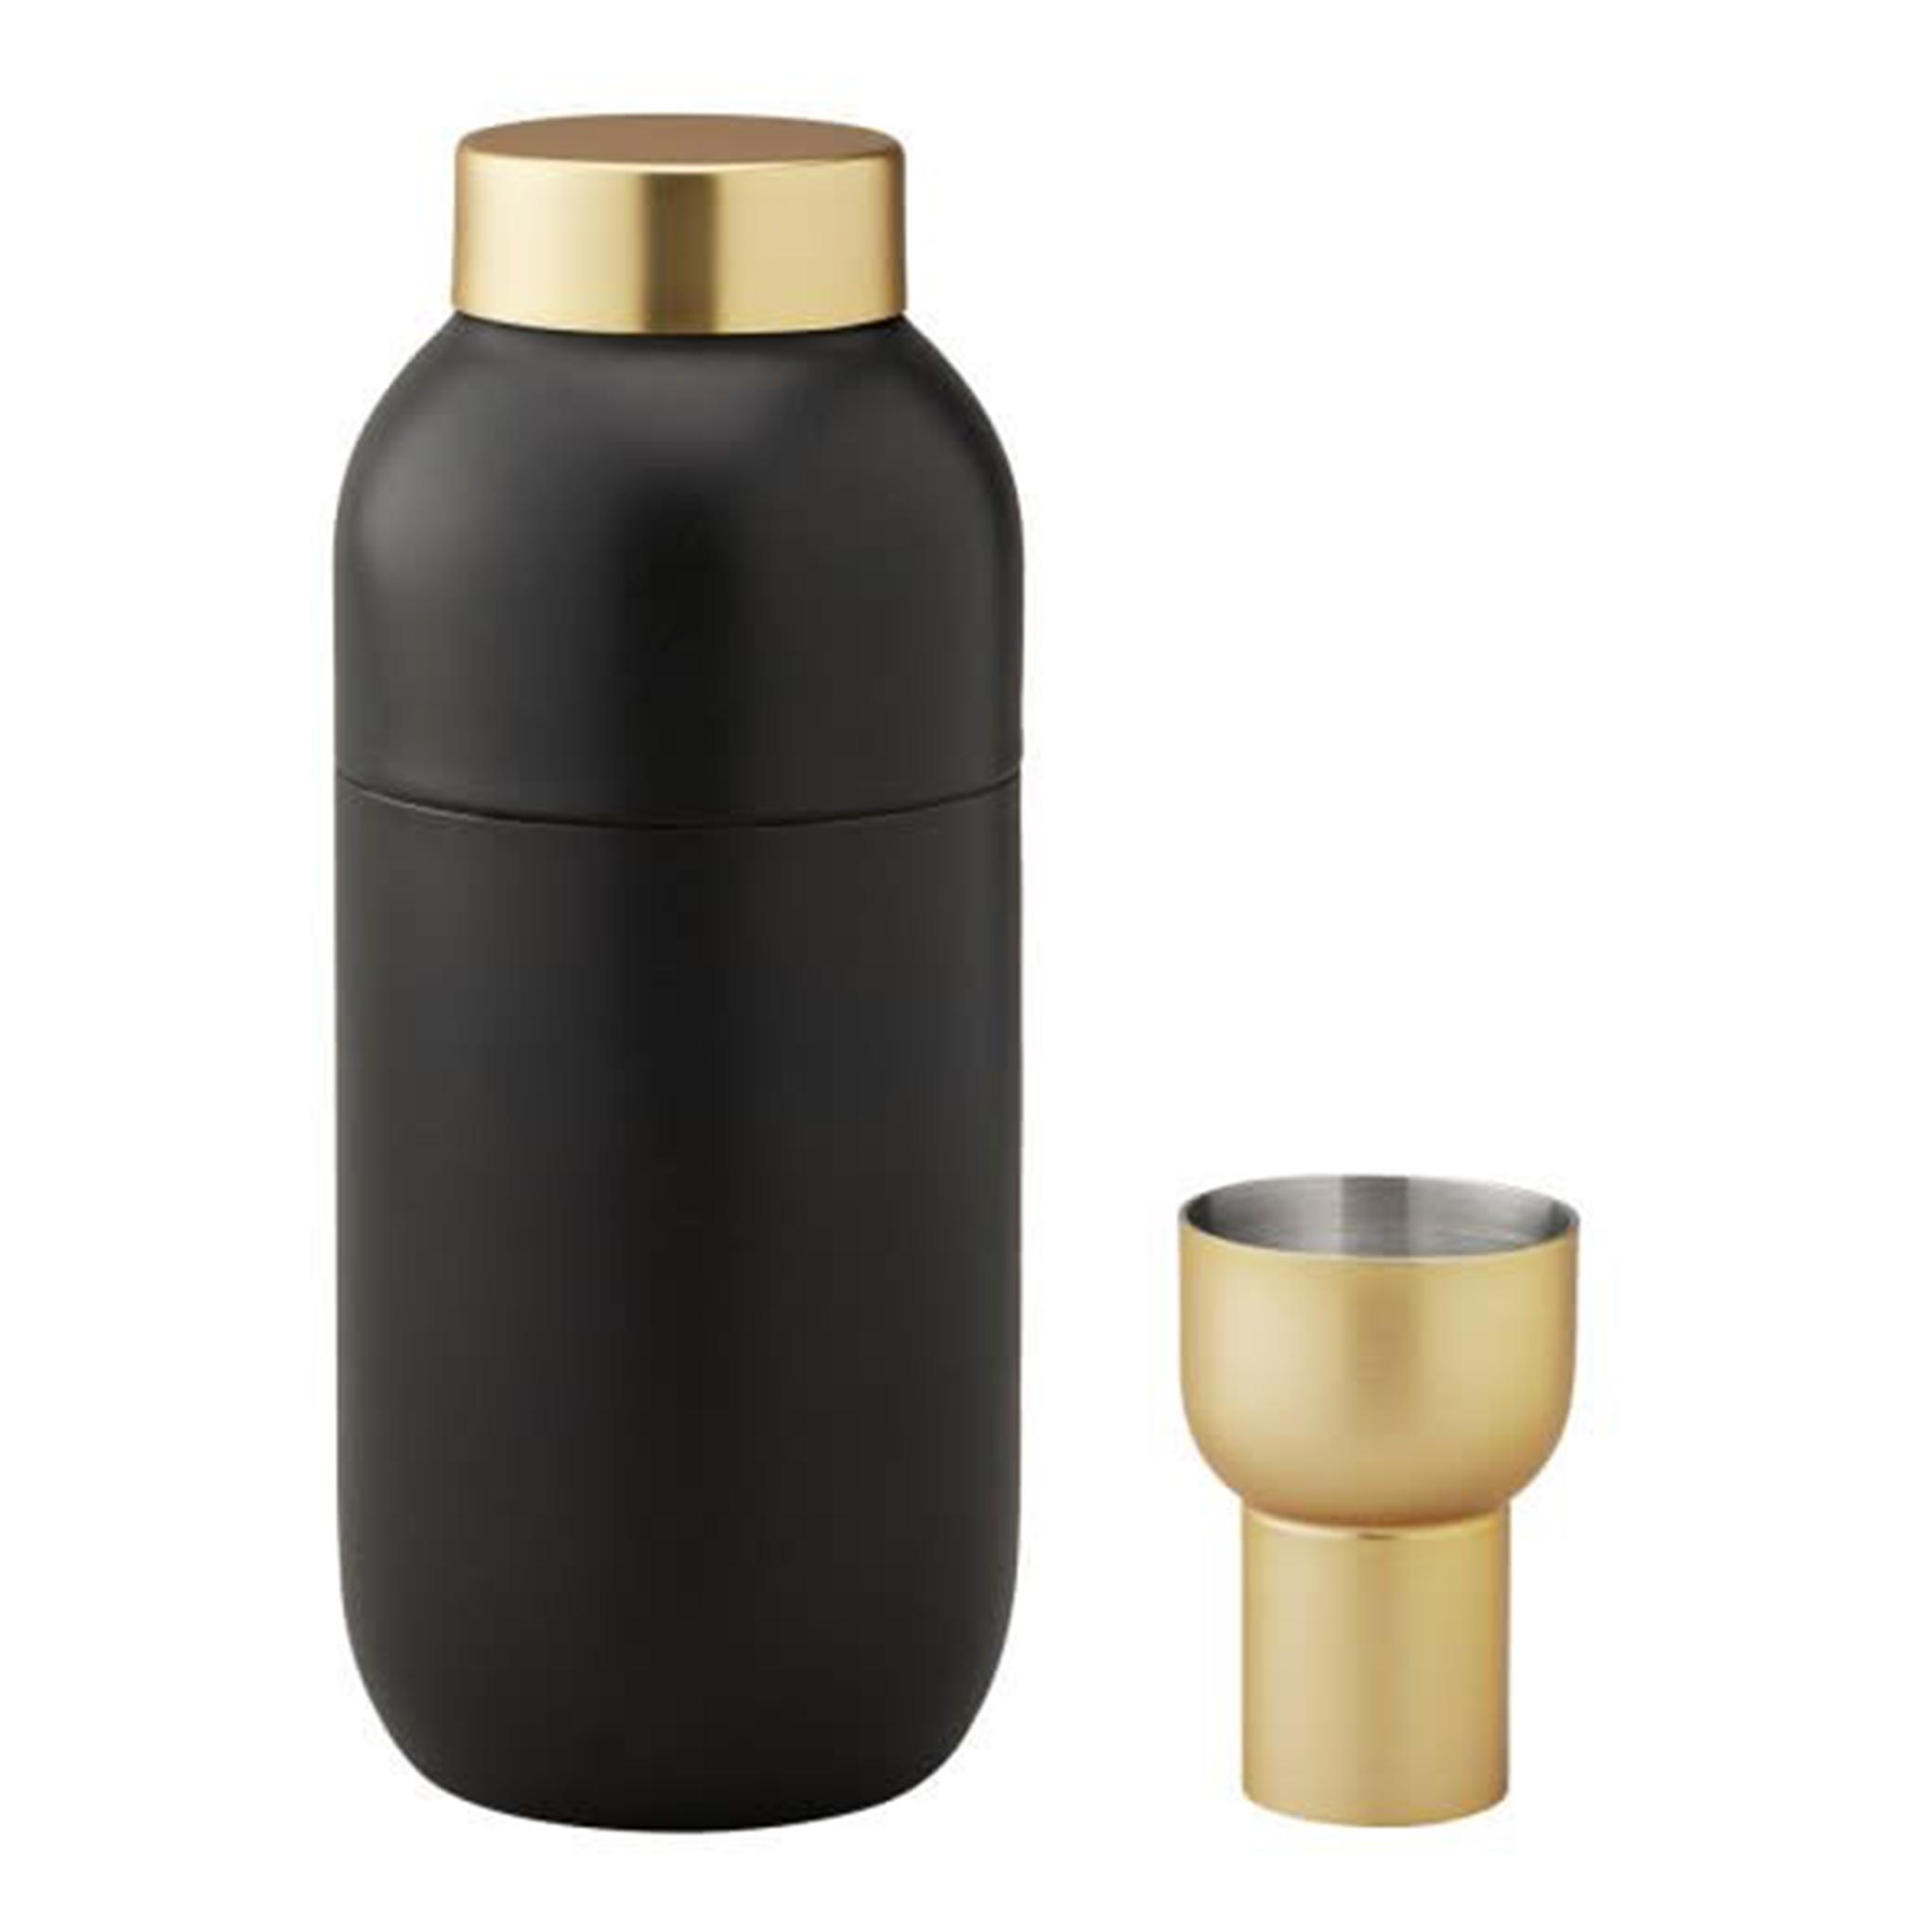 STOCK & PANTRY:  Cocktail shaker